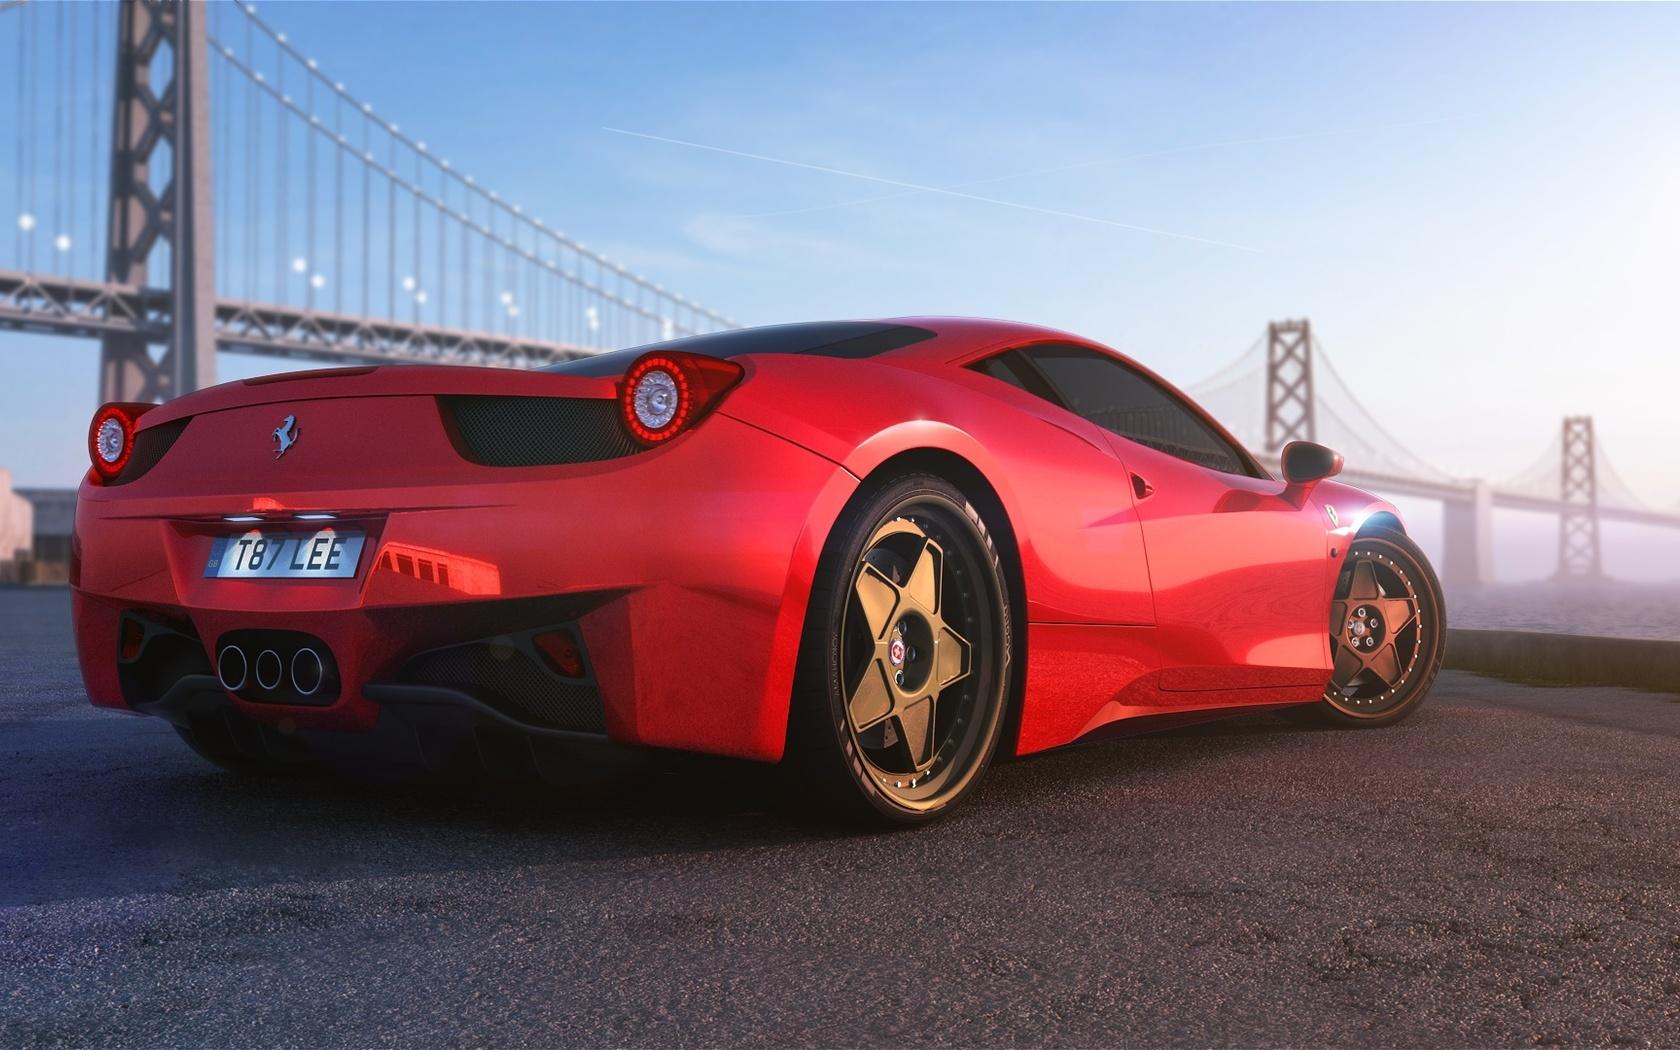 Ferrari 458 Italia wallpaper 30323 1680x1050